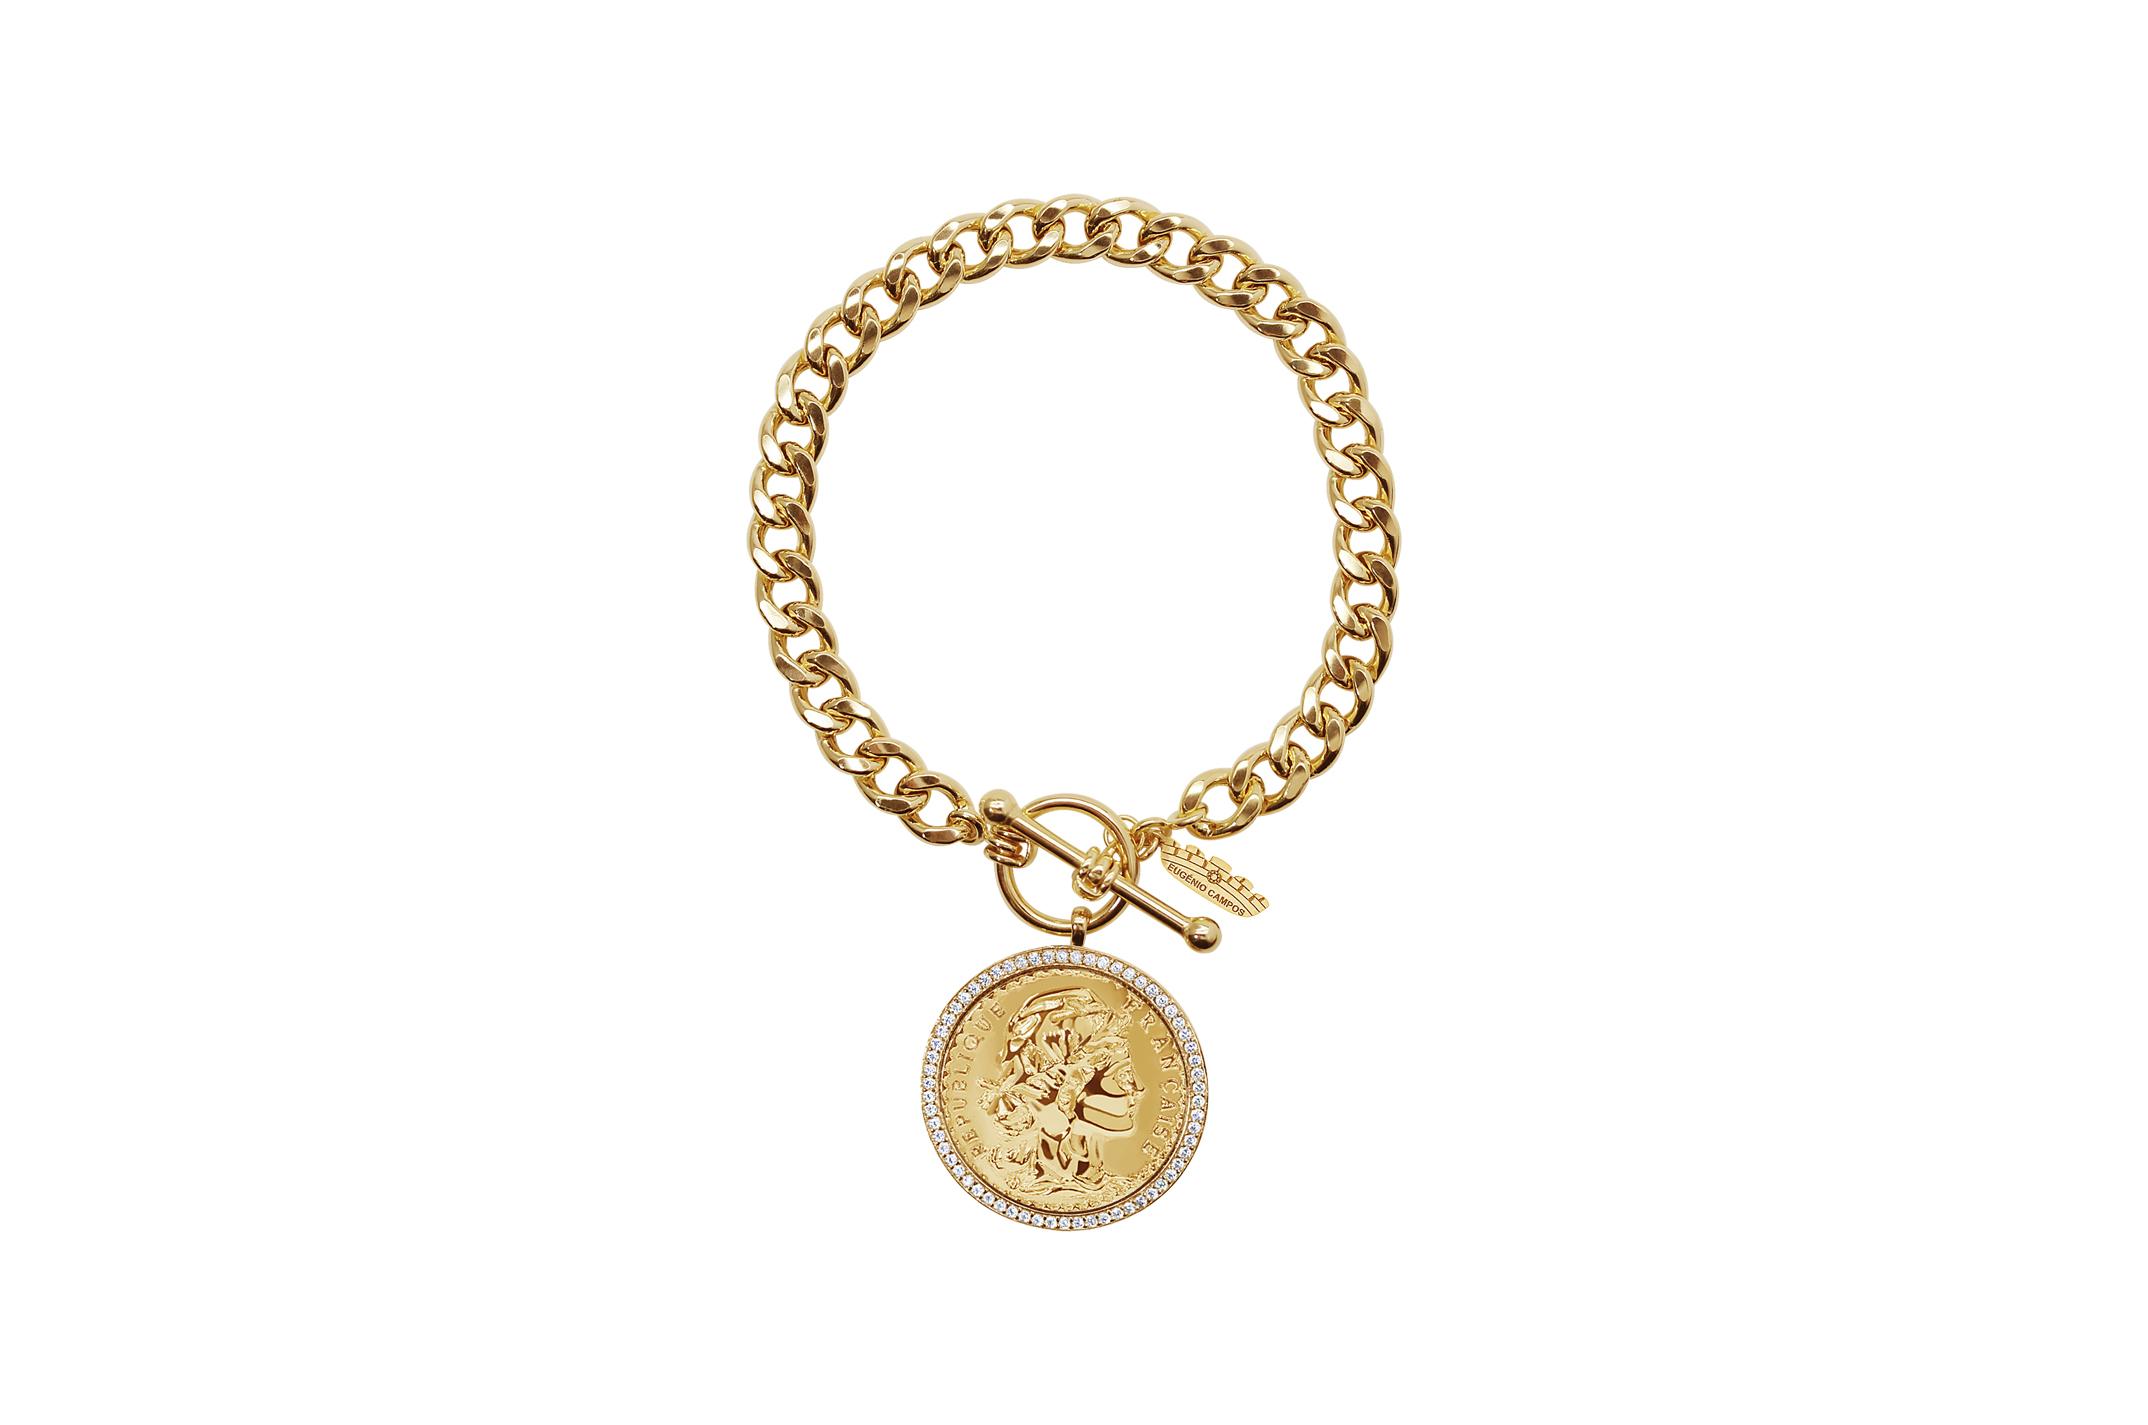 Joia: pulseira;Material: prata 925;Peso: 16.10 gr;Pedras: zircónias;Cor: amarelo;Medida: ;Género: mulher